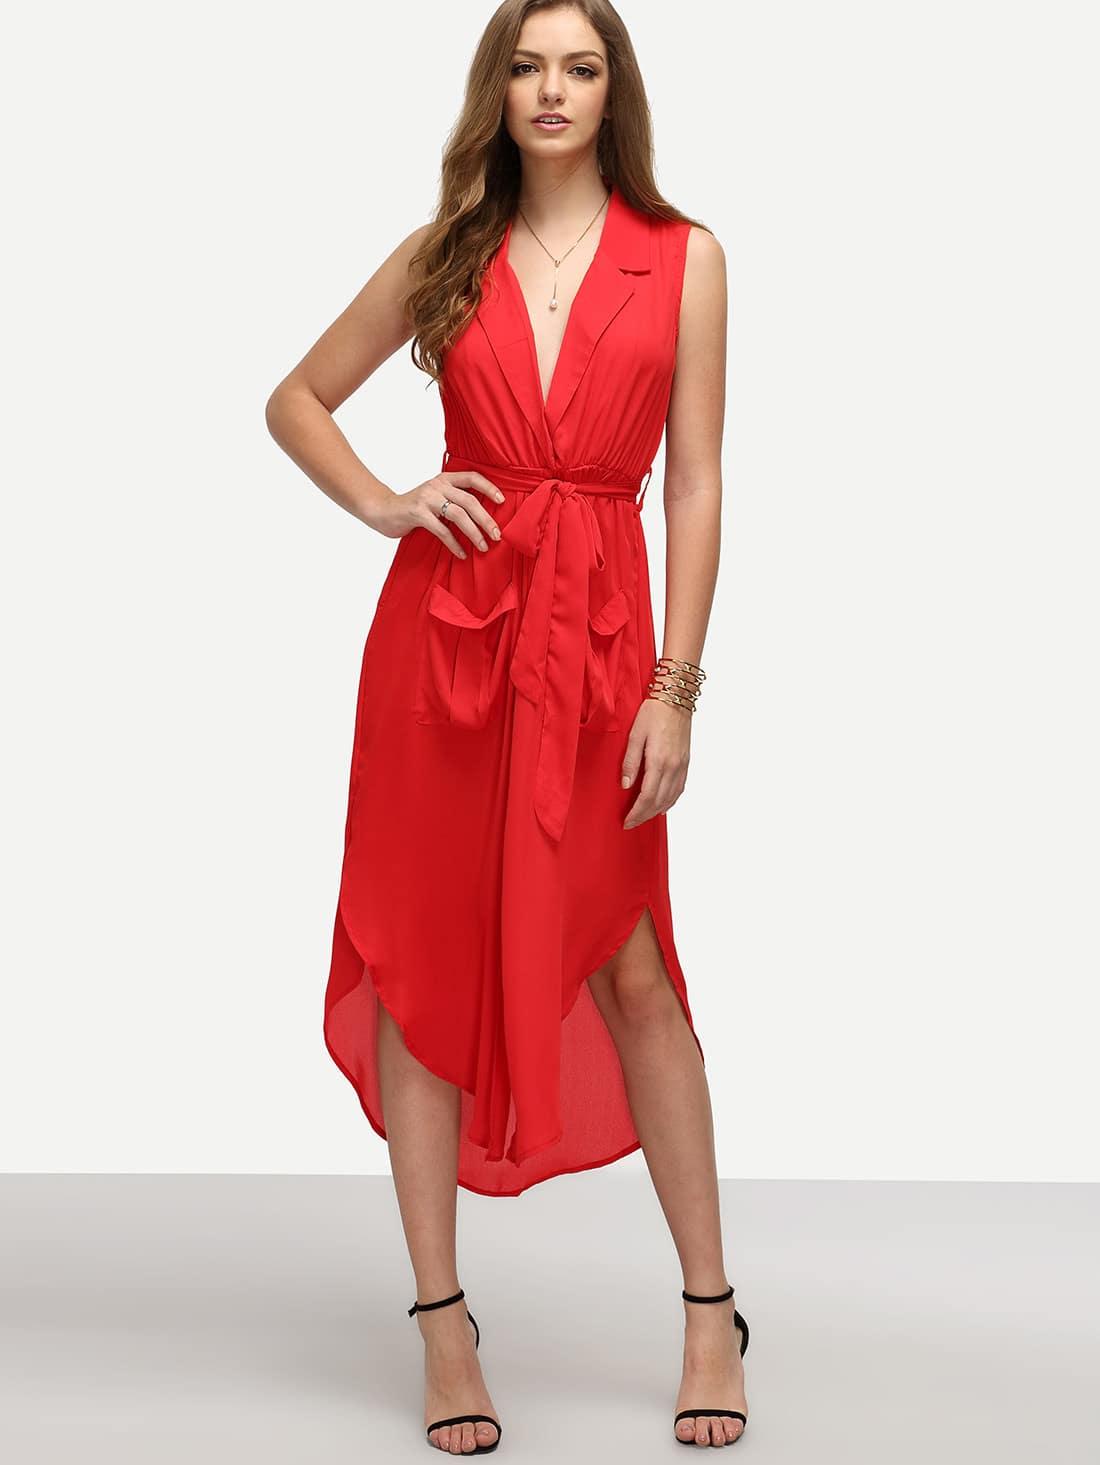 Red Lapel Self-tie HIgh Low Chiffon Dress With Pockets dress160608307